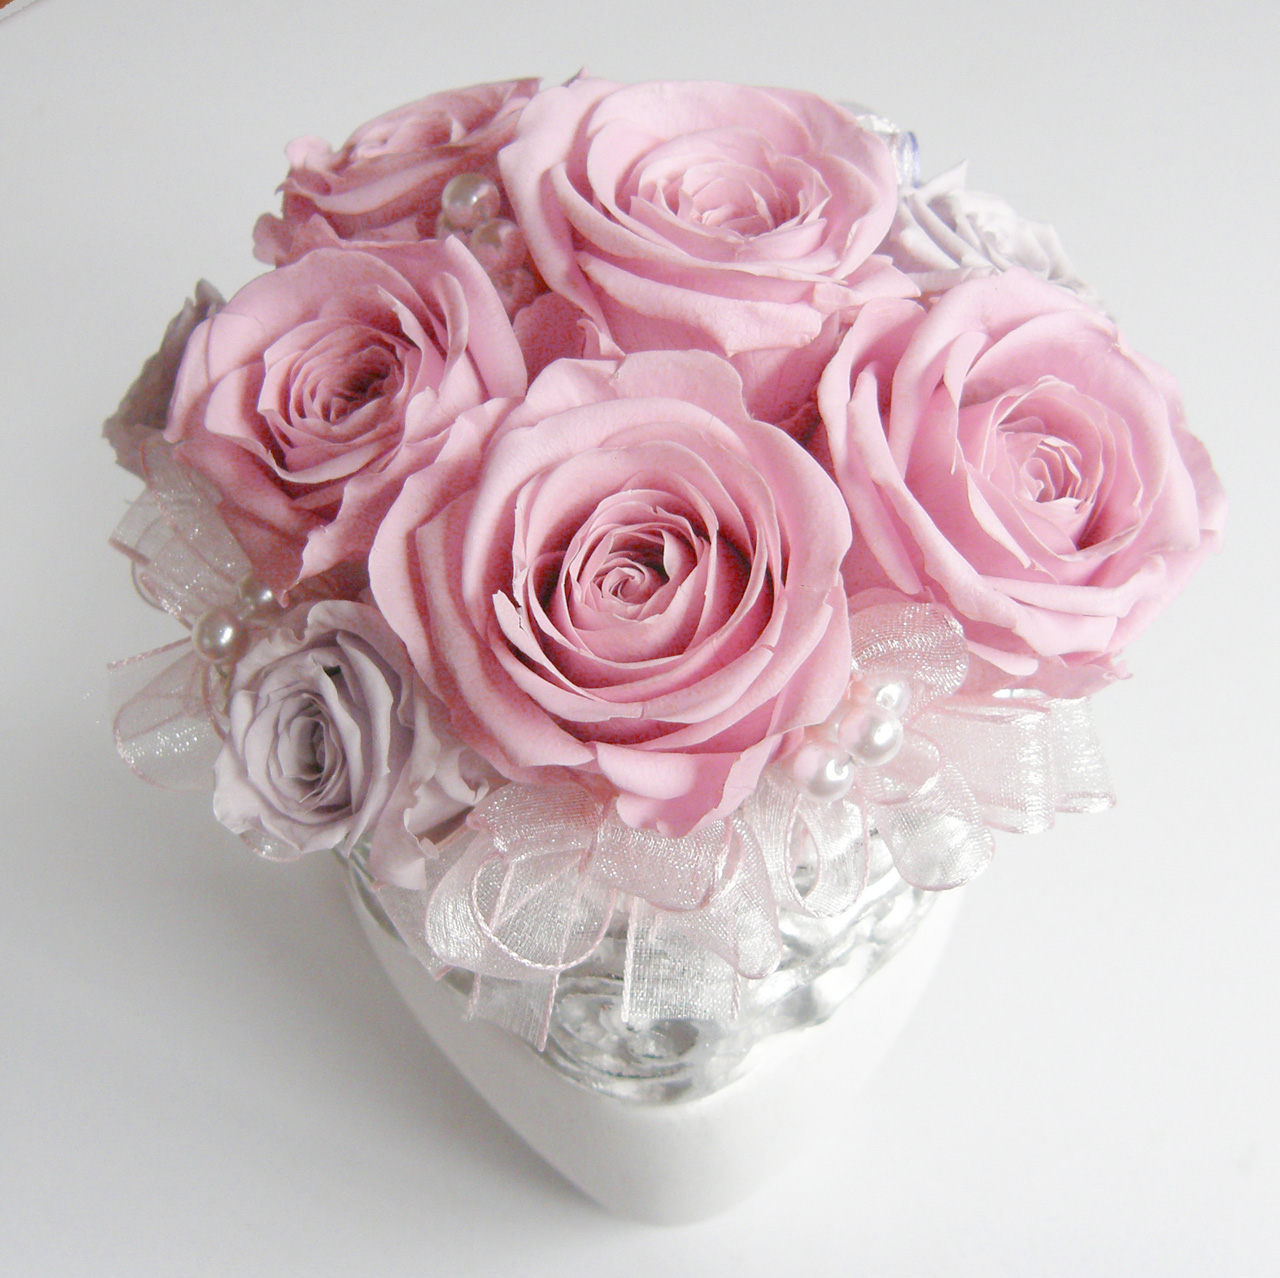 Rose Rose ・・・